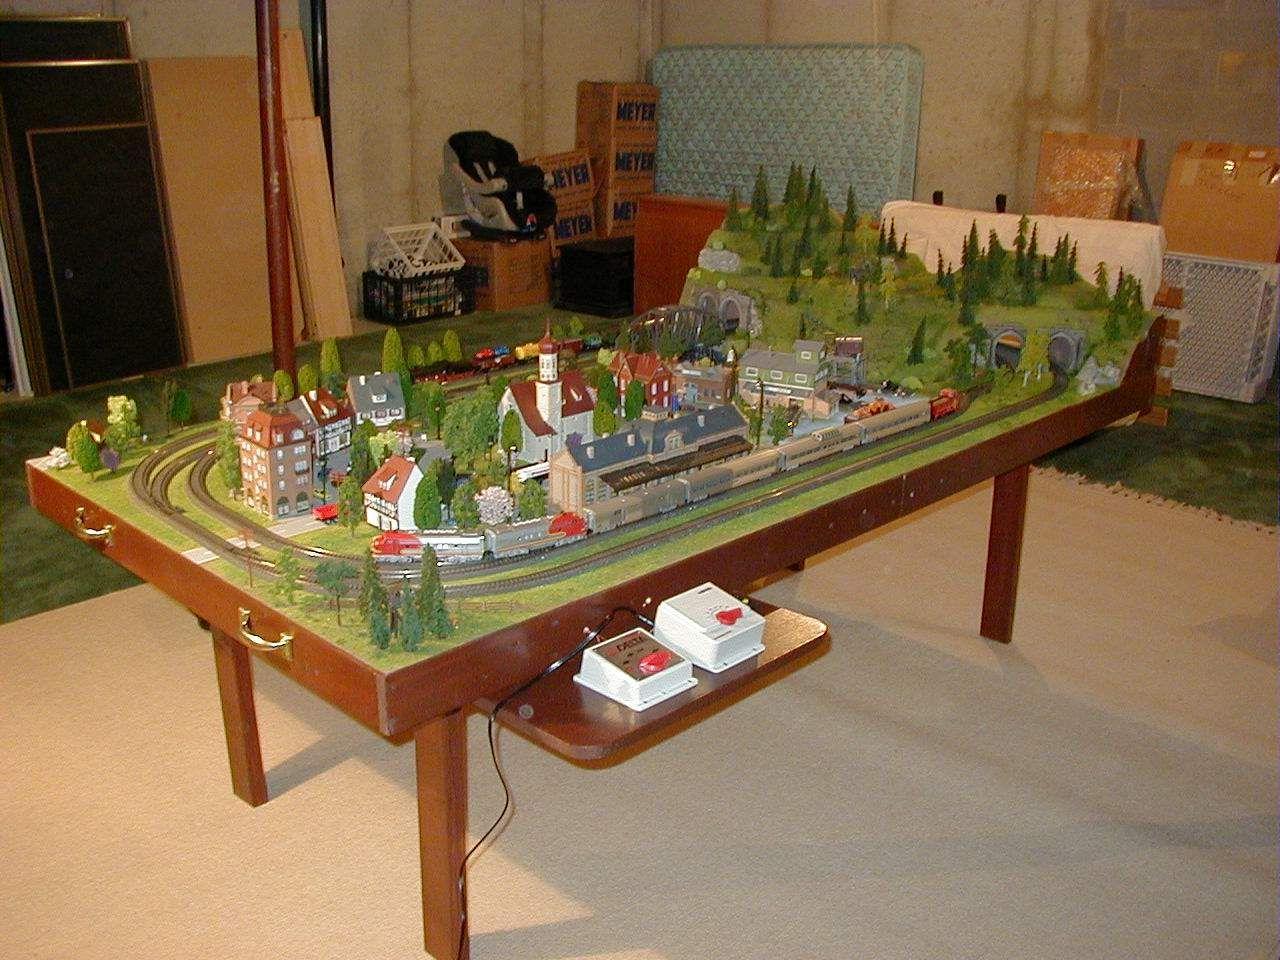 4X8 Marklin HO Scale Layout Model Train Image 1 | Trains